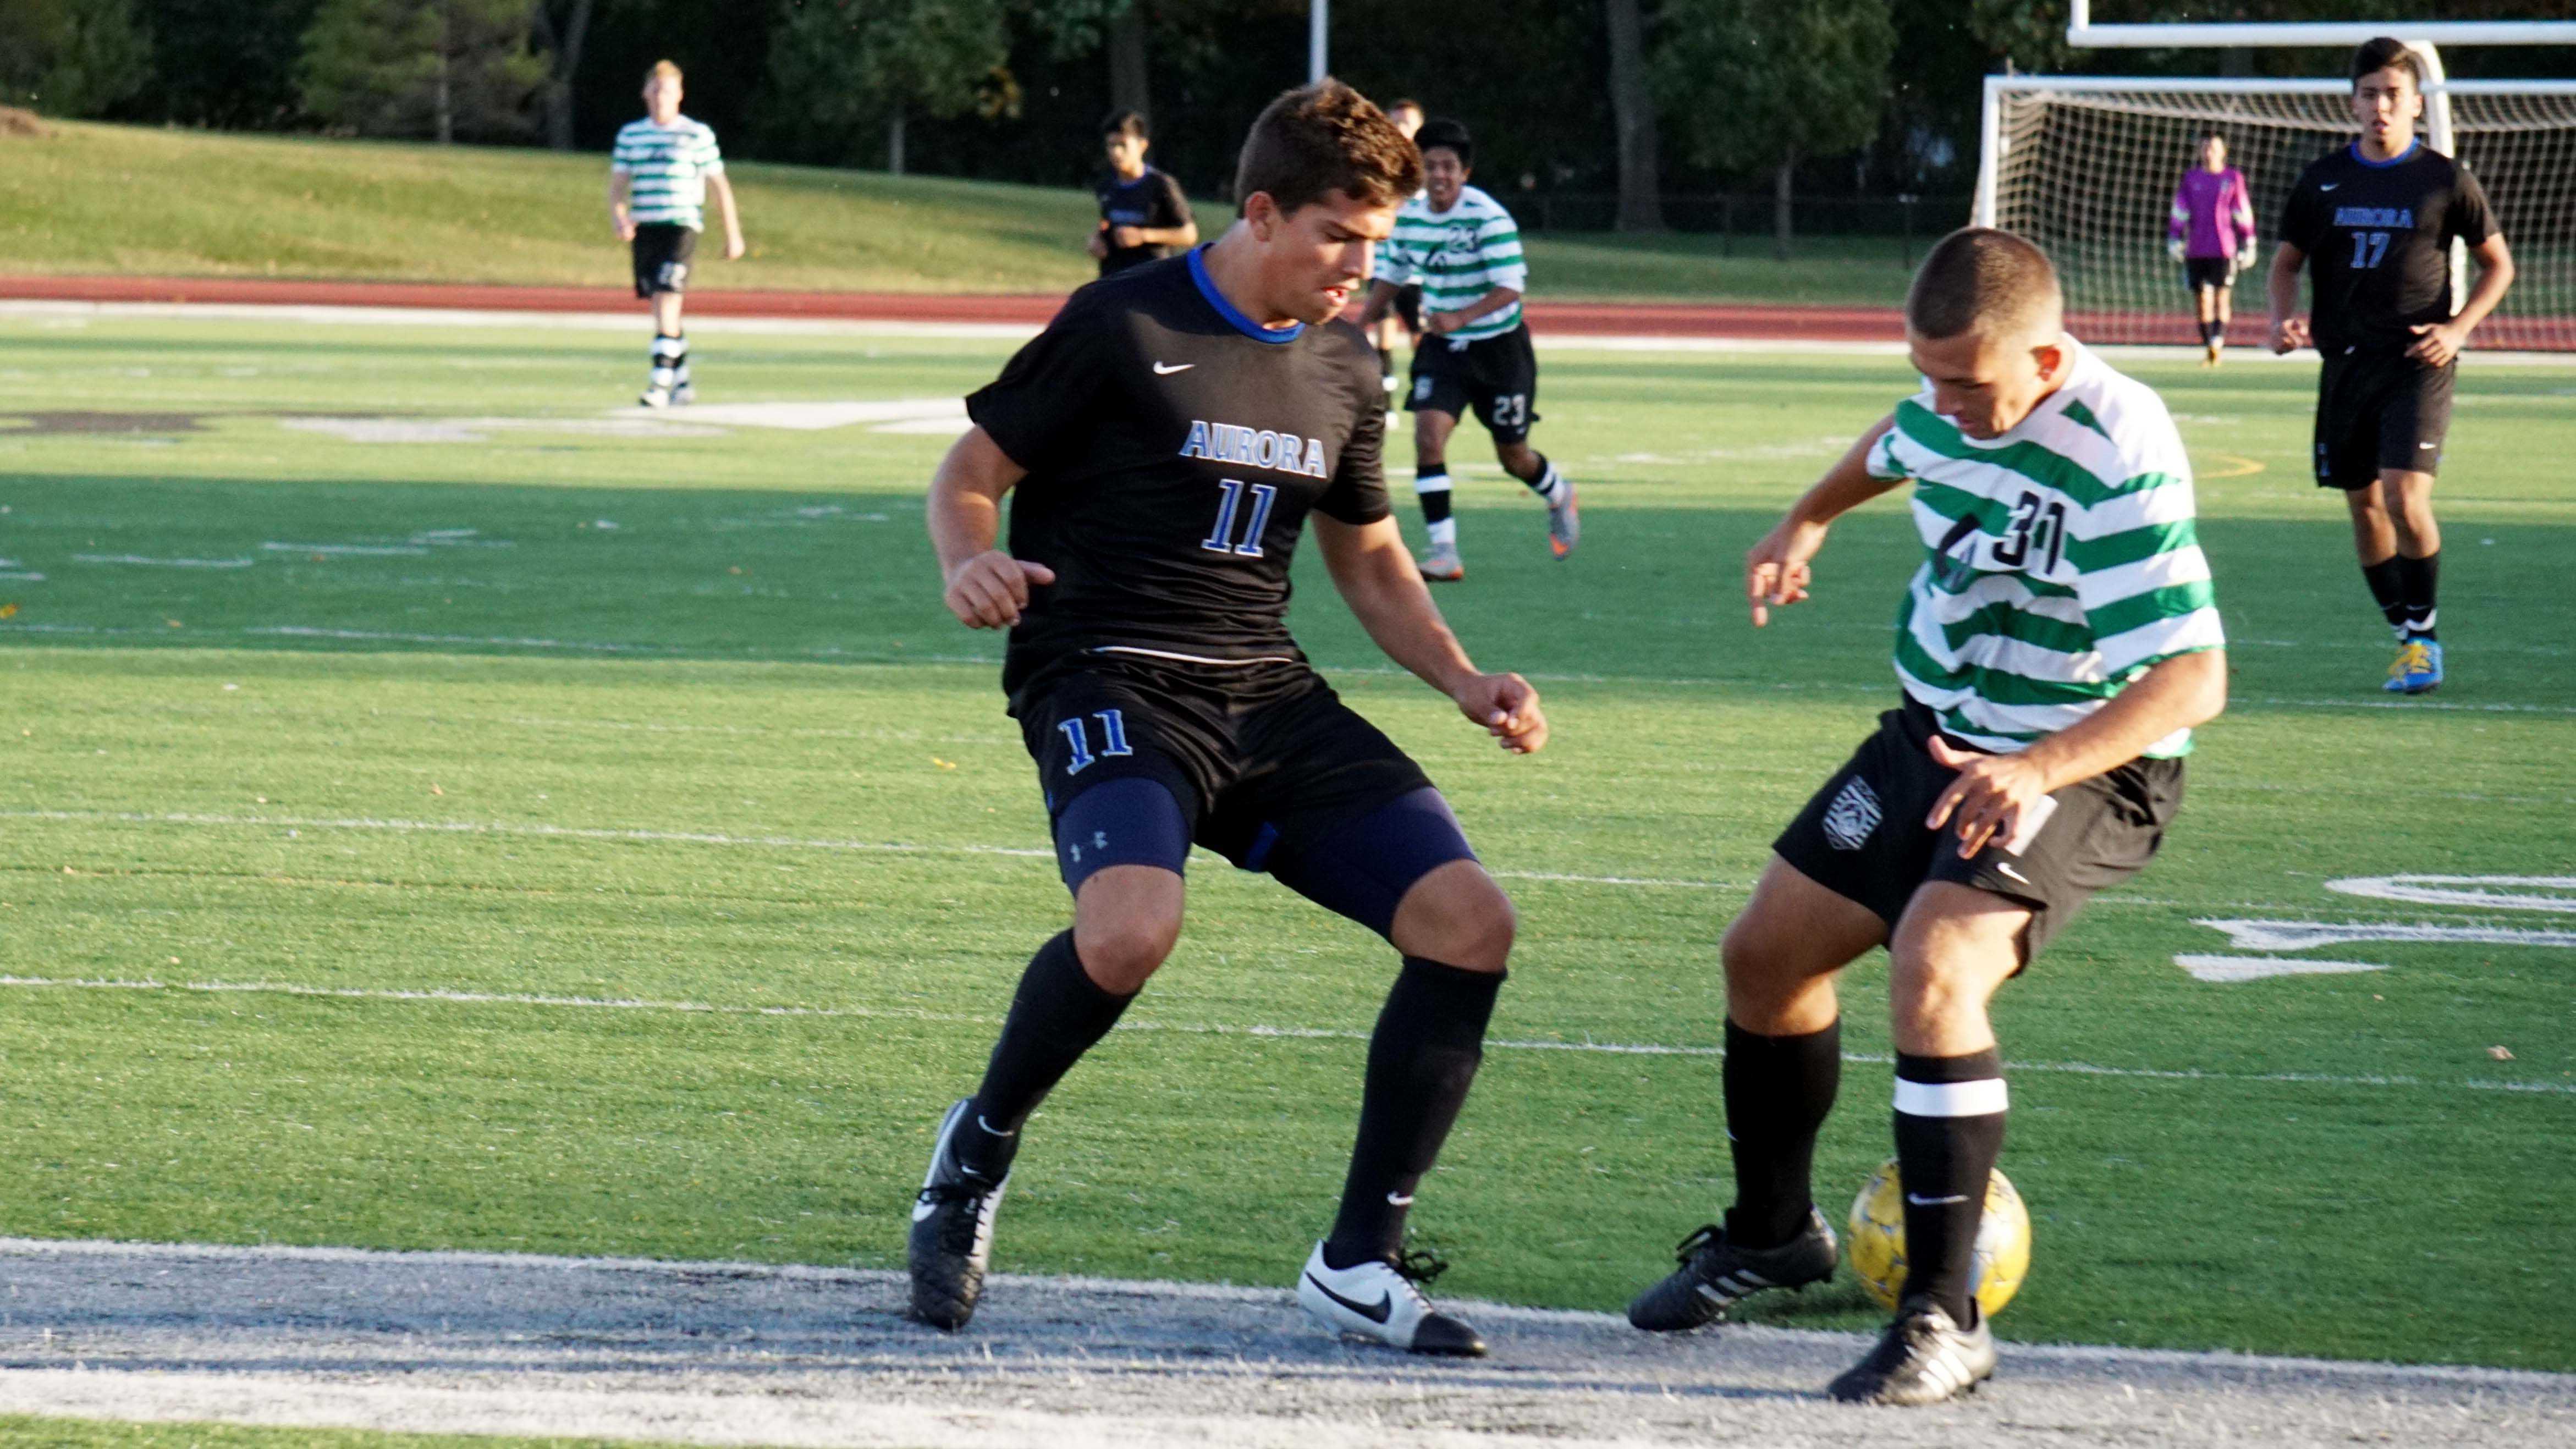 Chaparral Midfielder Zoran Tanasic juking past Aurora University JV Defender at the College of DuPage on Oct. 15.